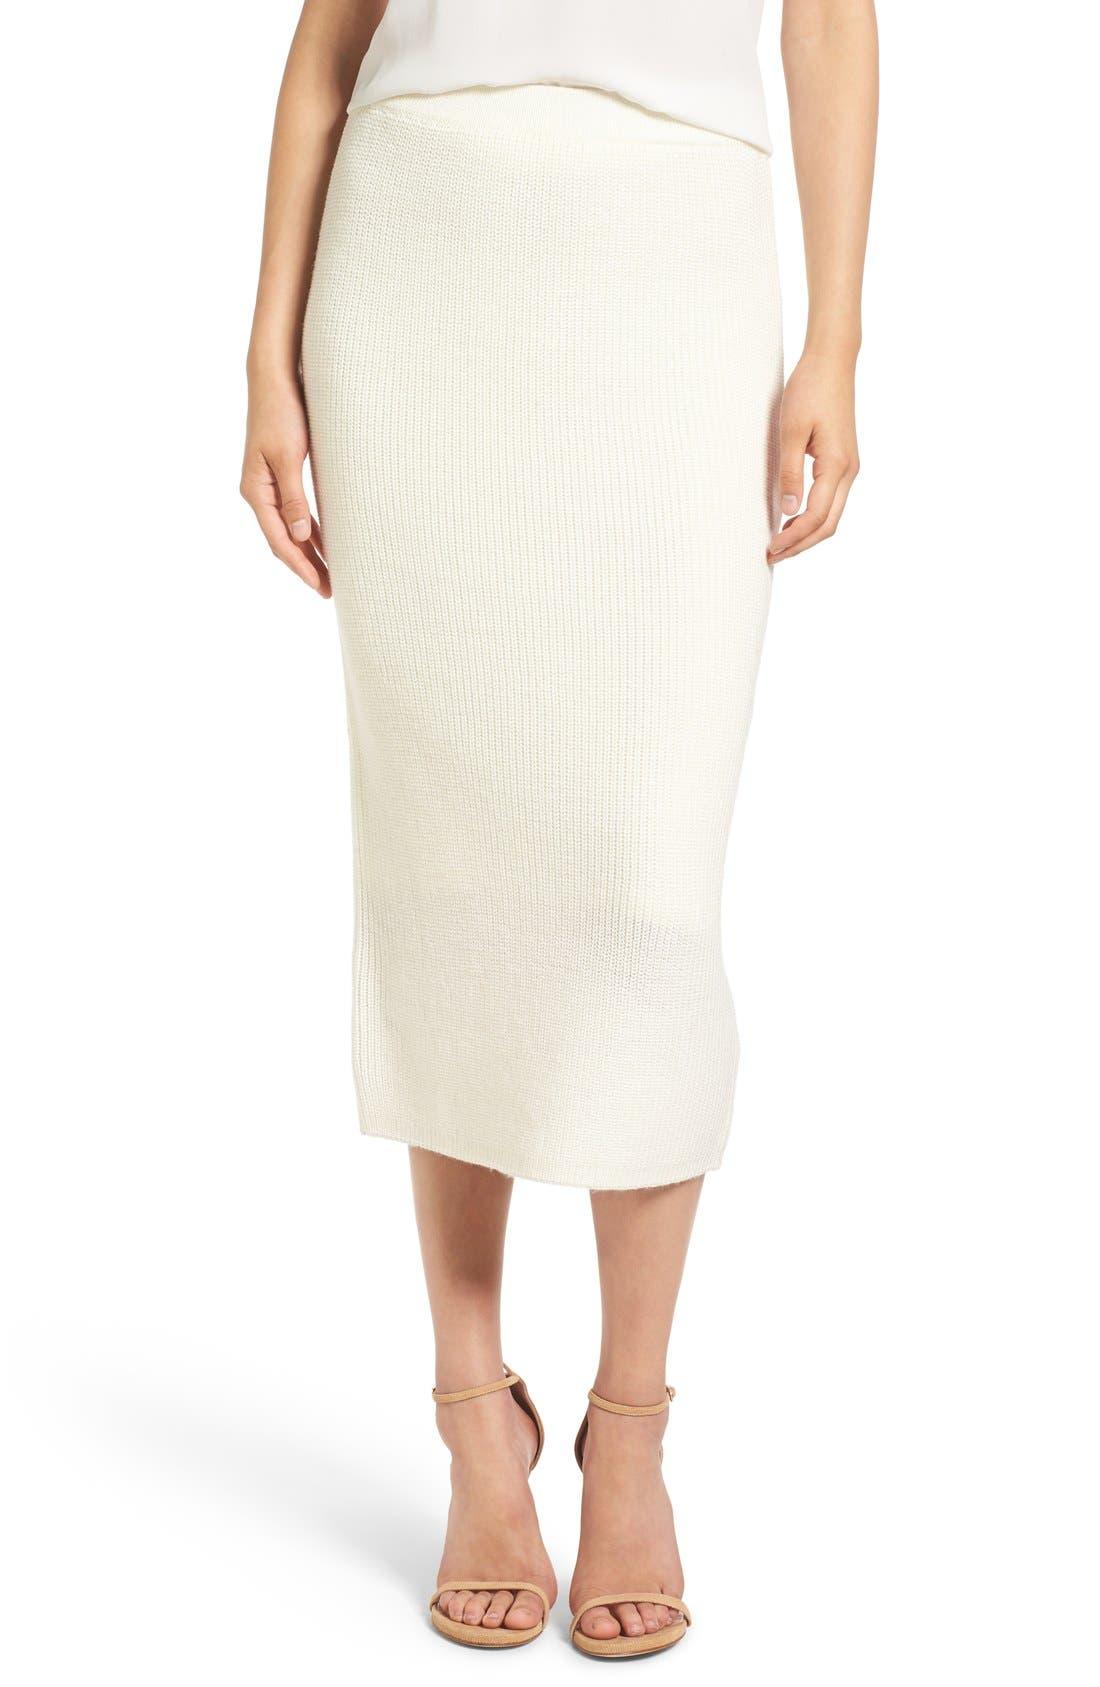 by Lauren Conrad 'Copenhagen' Knit Tube Skirt,                         Main,                         color, 100